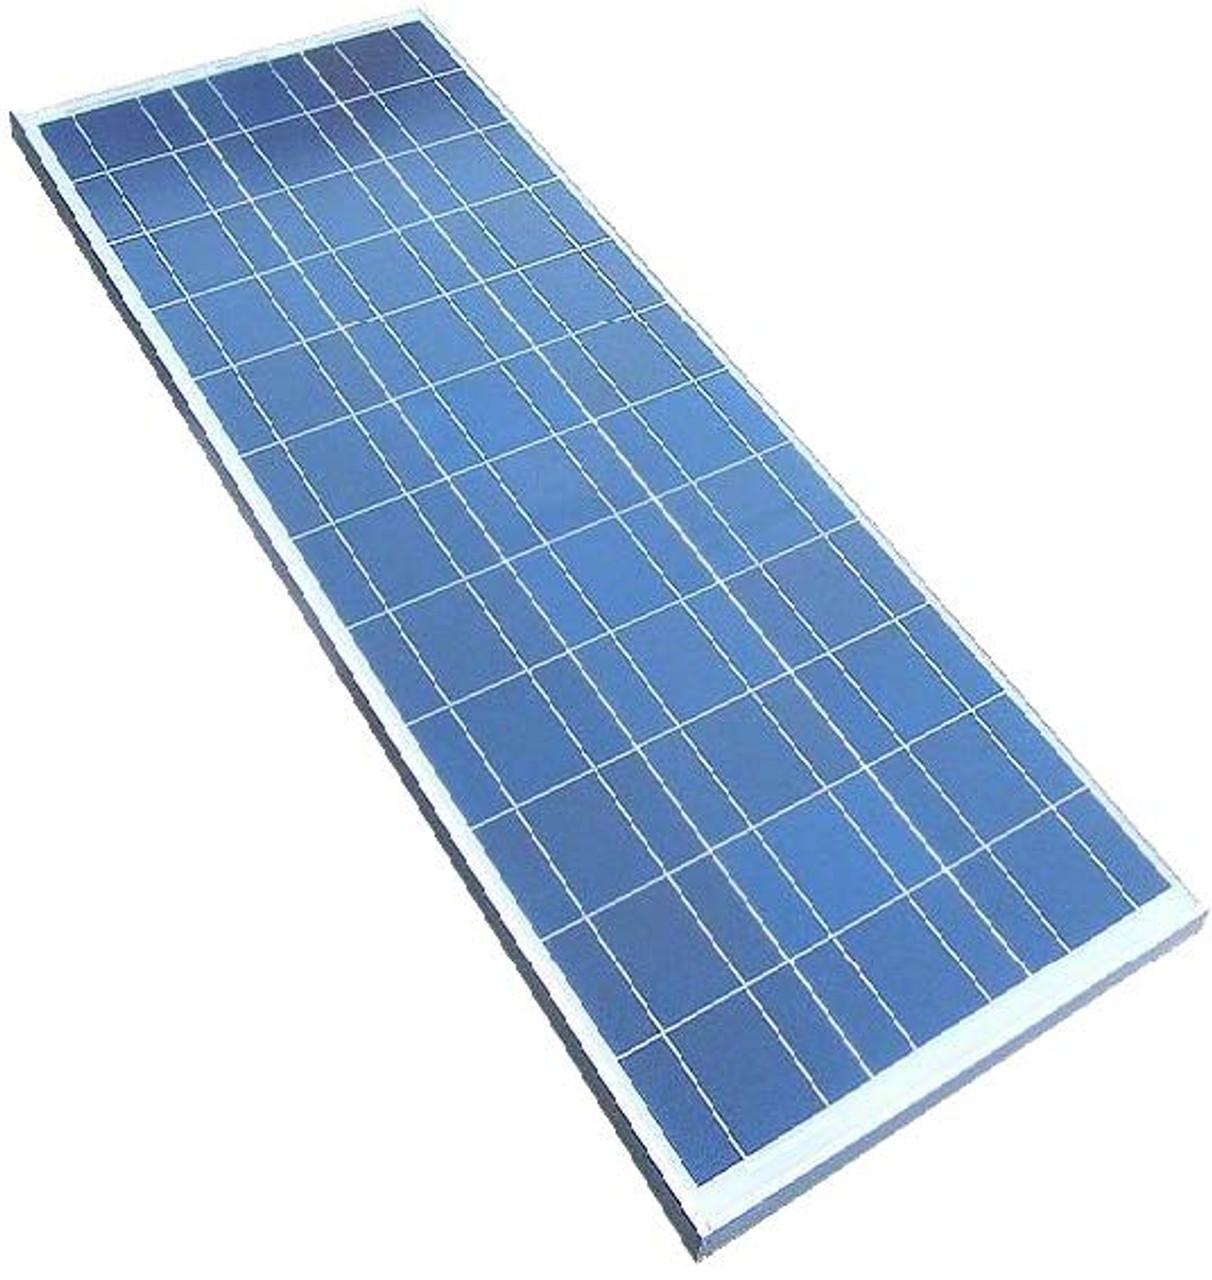 Solartech Power Spm125p S F 125w 12v Industrial C1d2 Poly Solar Panel